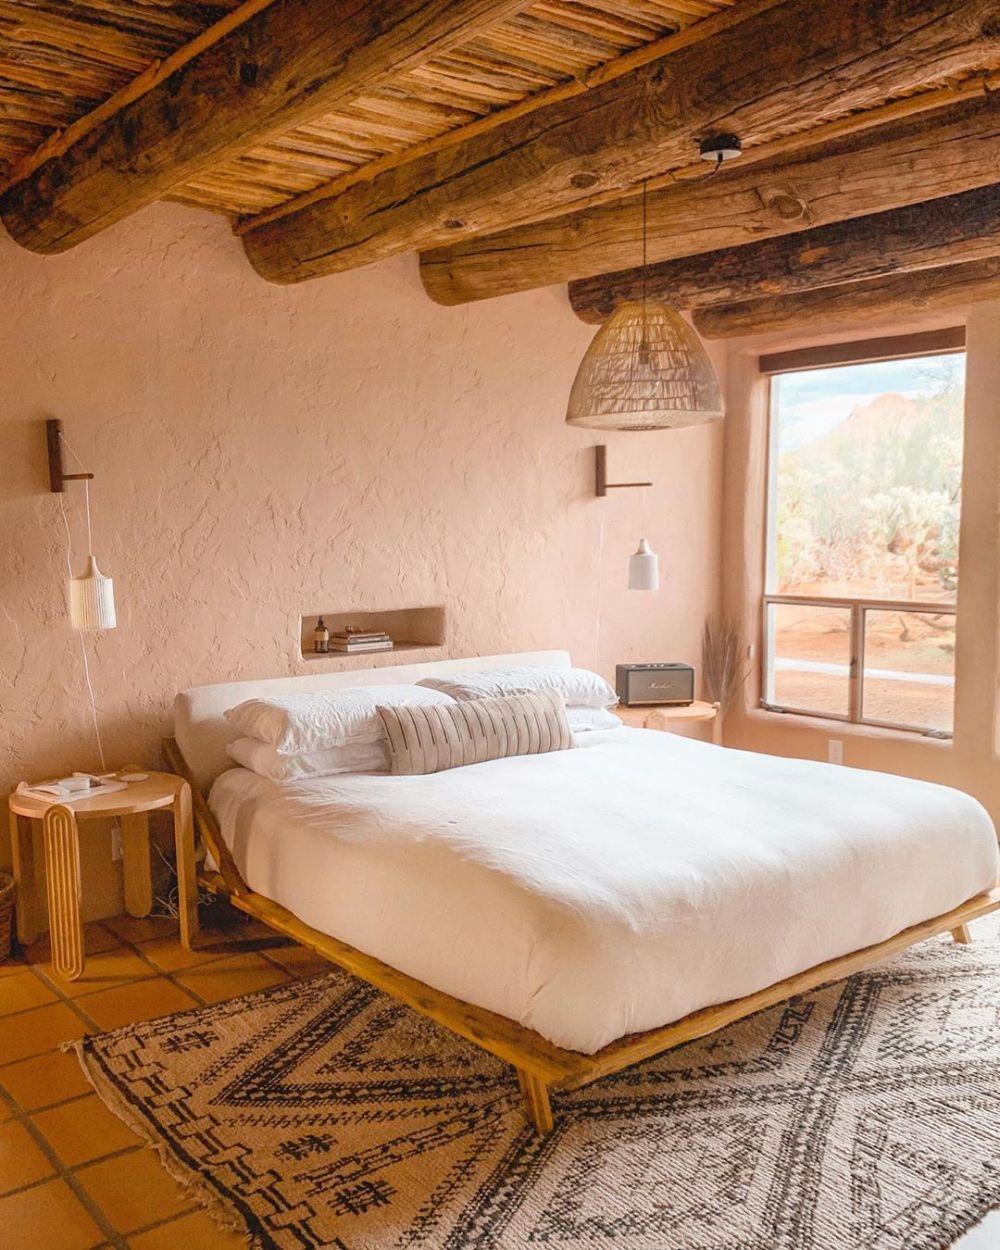 Bikin Kamarmu Hangat dan Romantis Kayak Villa Di Italia 5